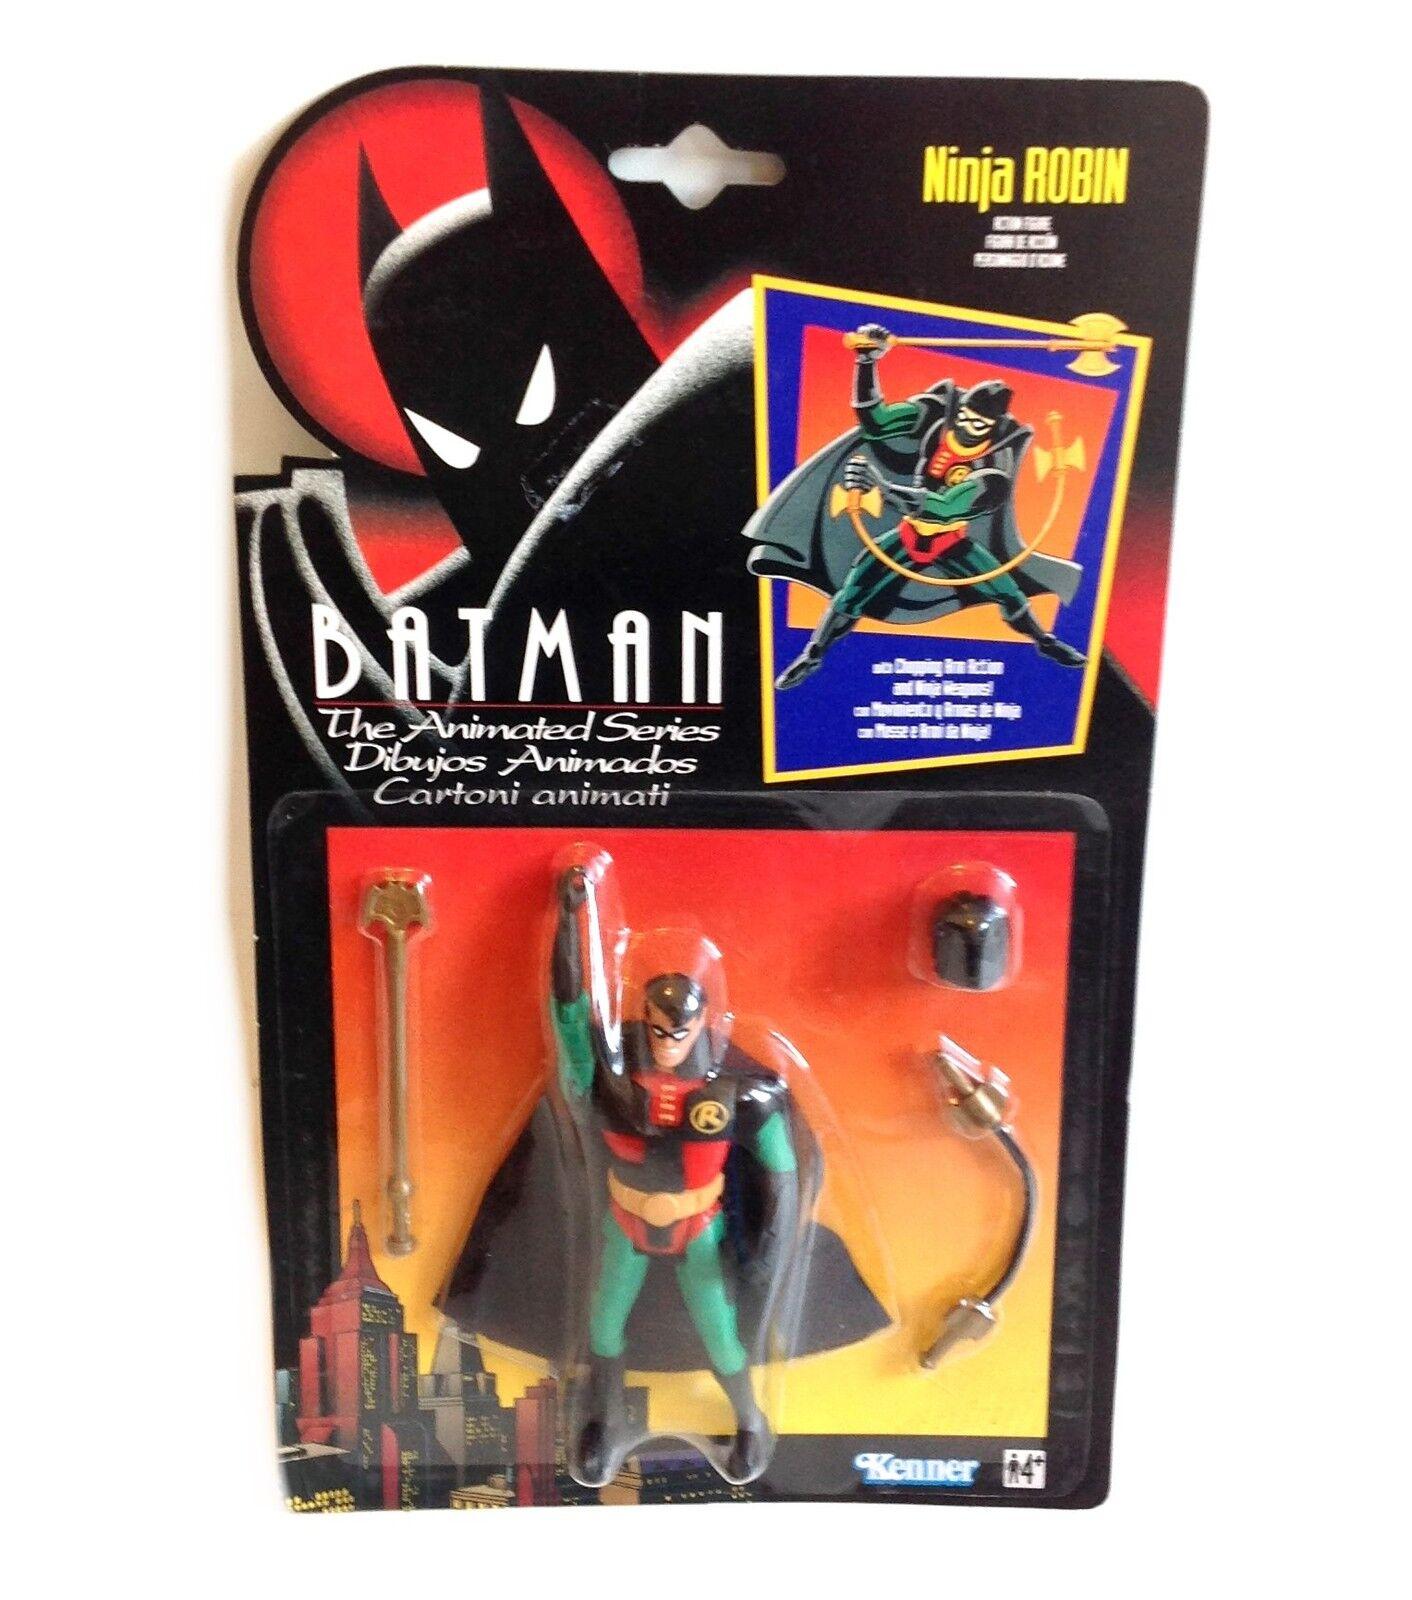 DC Comics ANIMATED SERIES BATMAN - NINJA ROBIN 5  toy figure boxed RARE